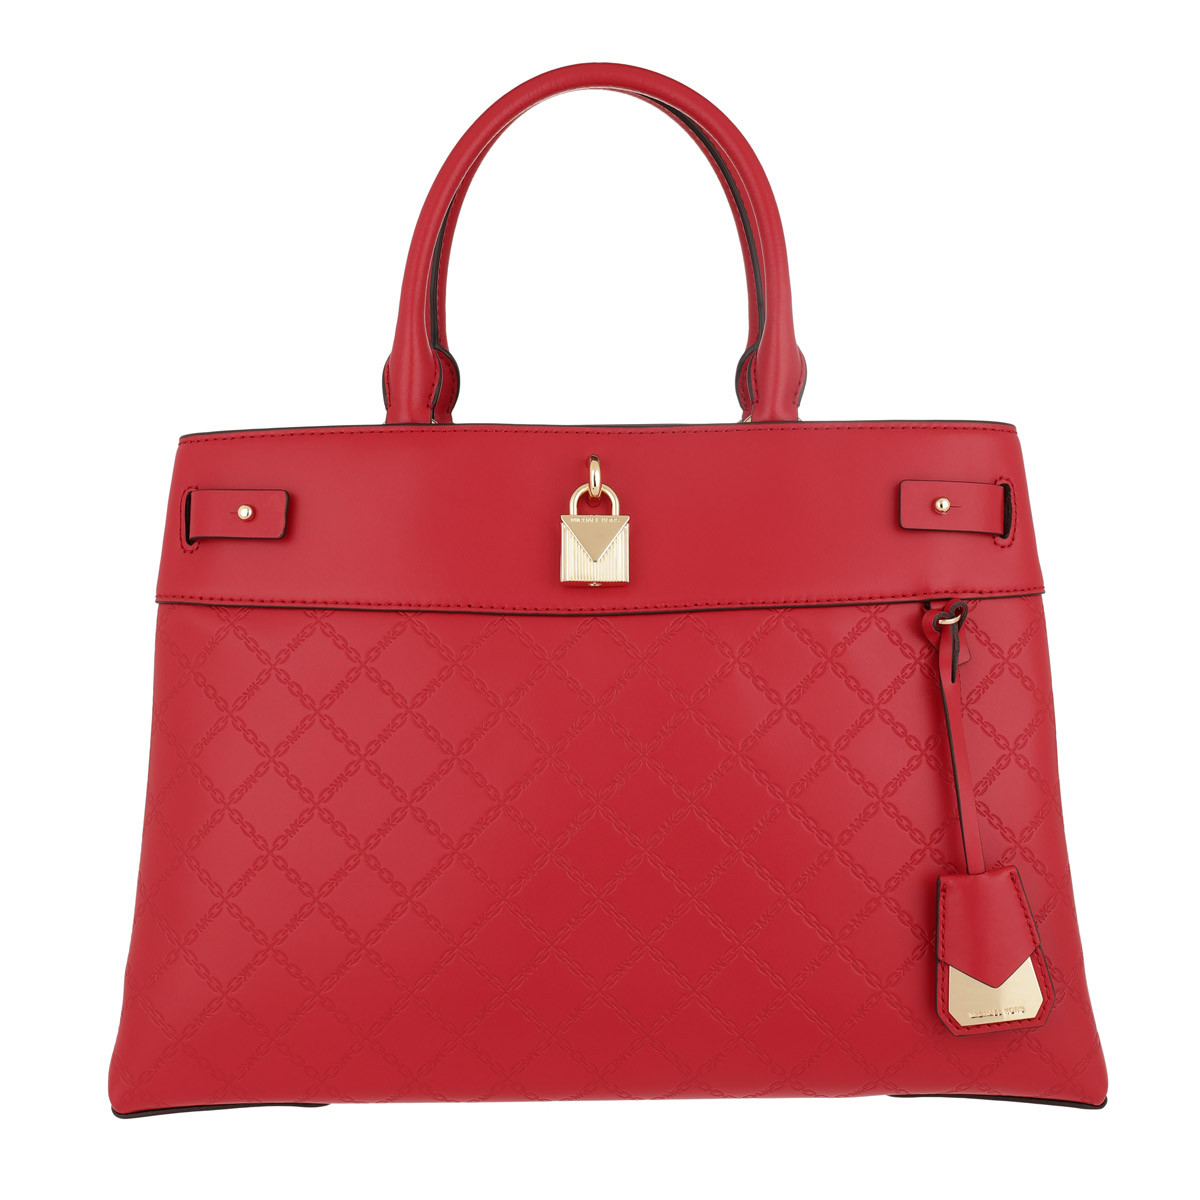 Michael Kors Satchel Bag - Gramercy Large Satchel Bright Red - in rot - für Damen